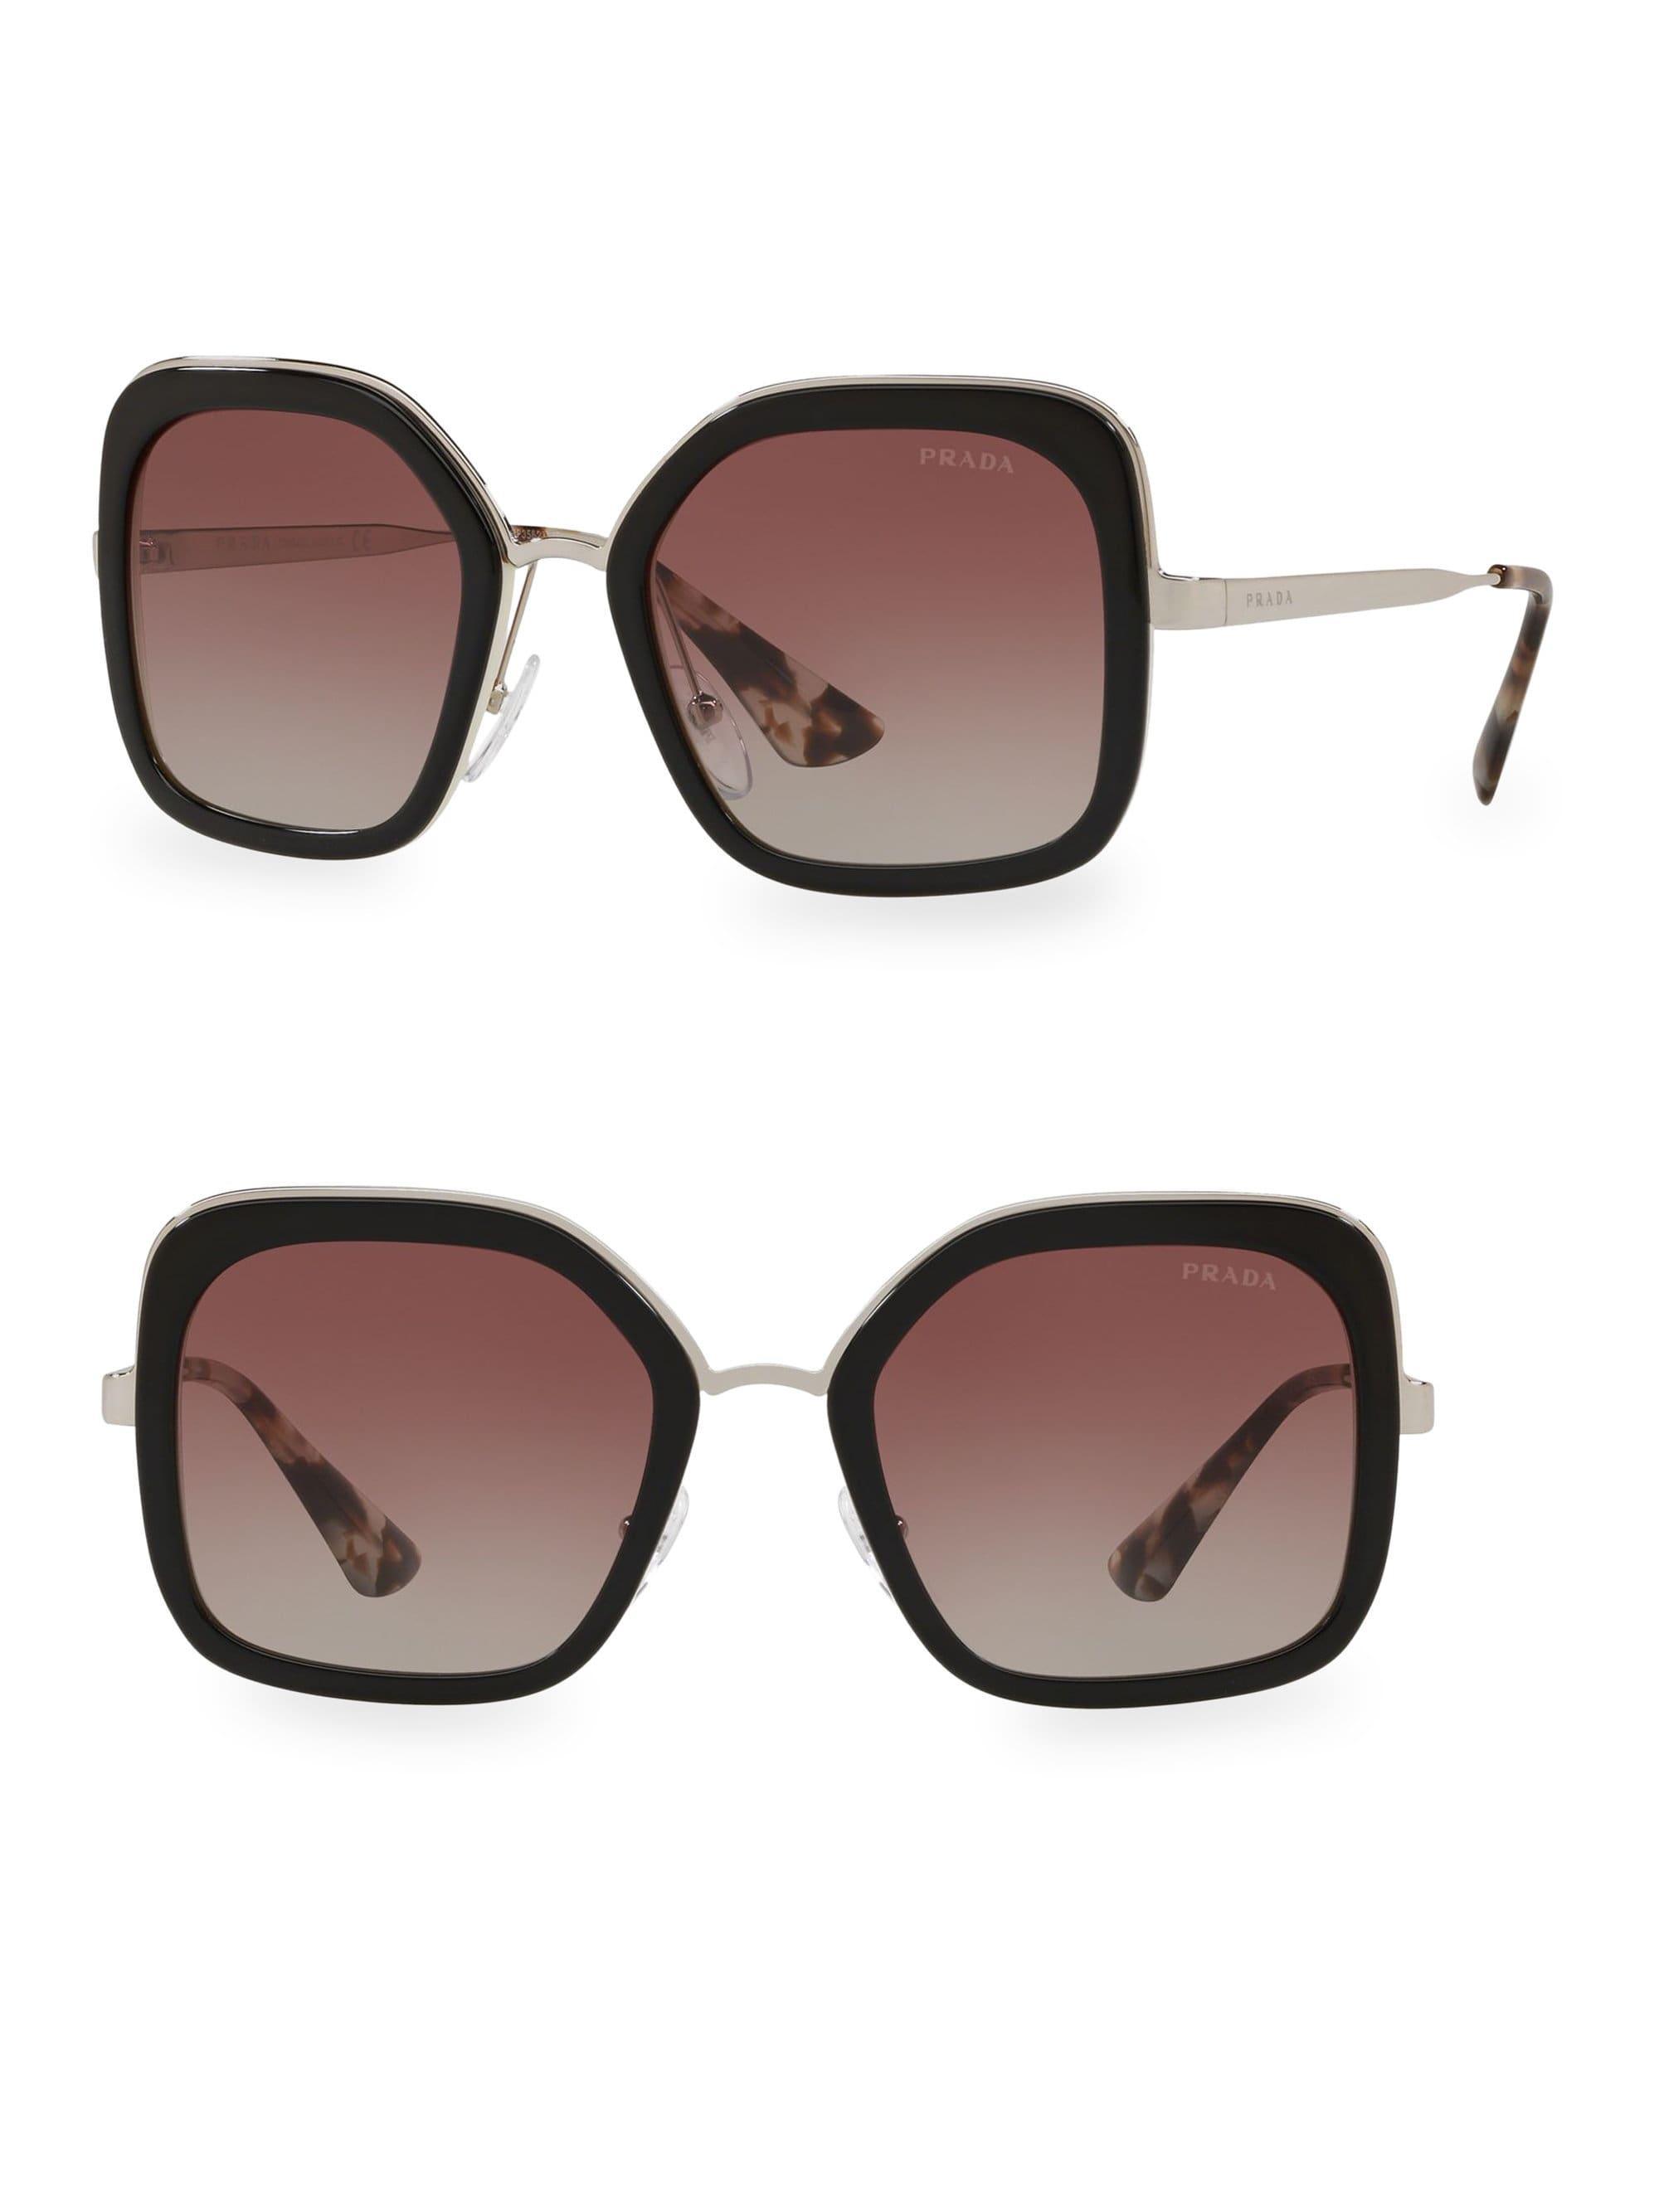 b4a5b4cbbc2a8 Prada - Women s Square 54mm Gradient Lens Sunglasses - Black - Lyst. View  fullscreen